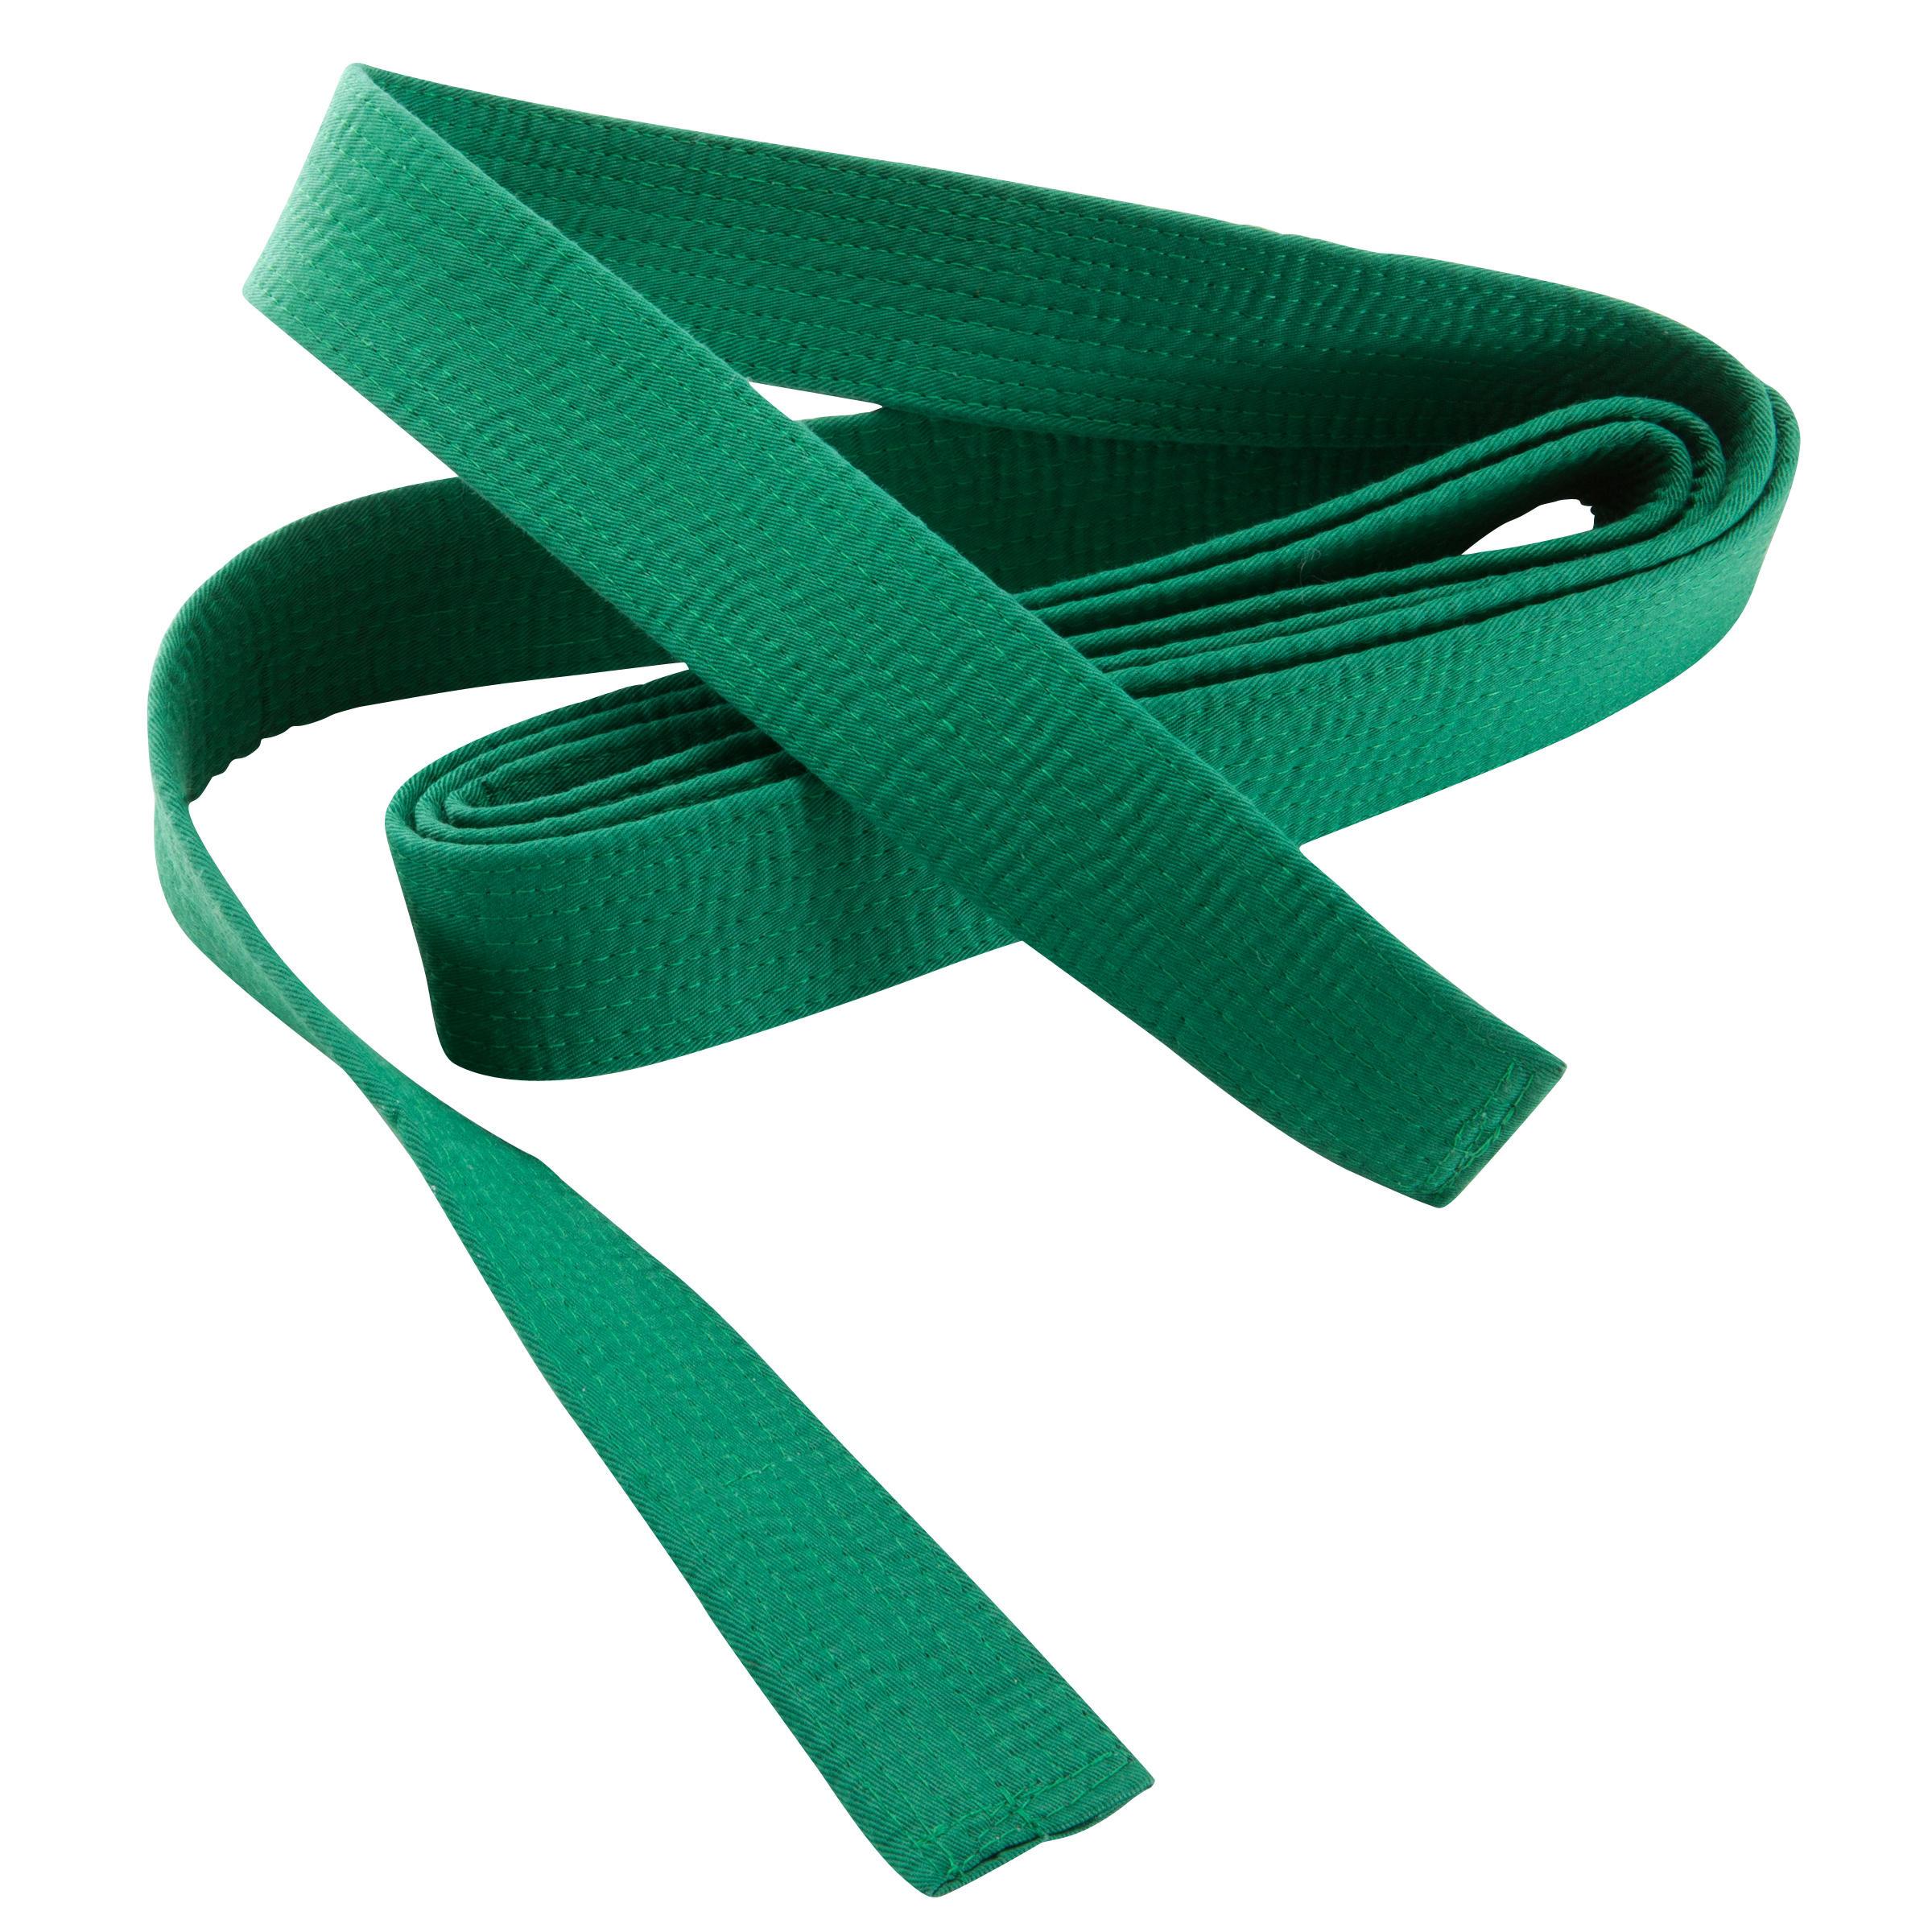 Outshock Judoband / Karateband piqué 3,10 m, groen